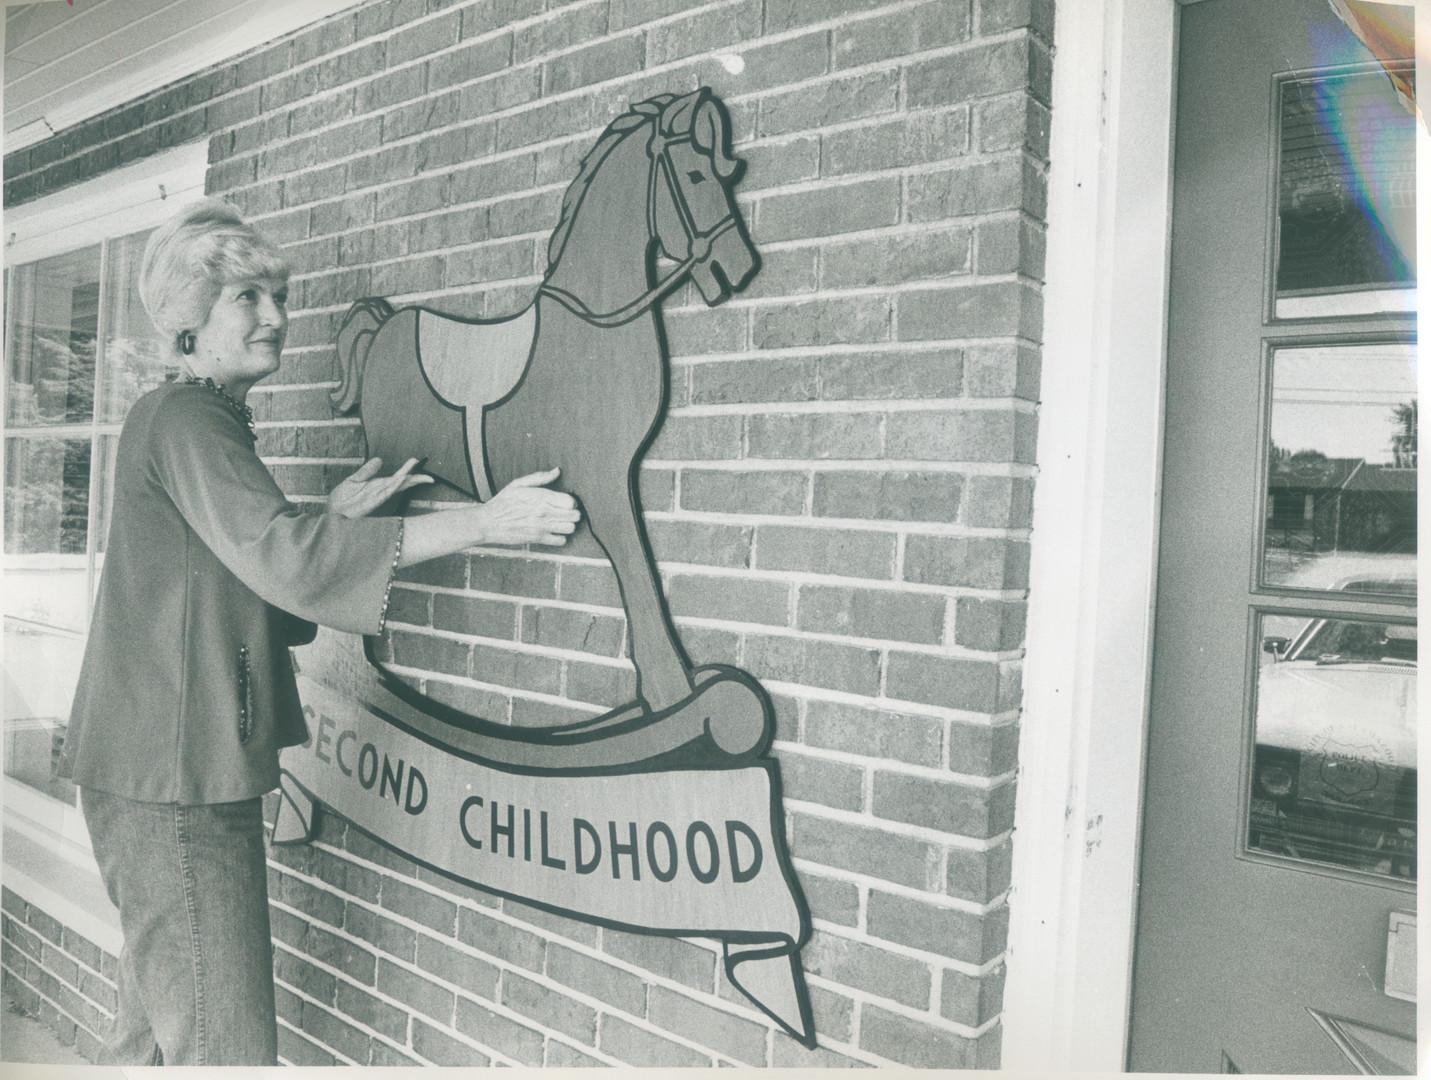 Second Childhood - opening.jpeg